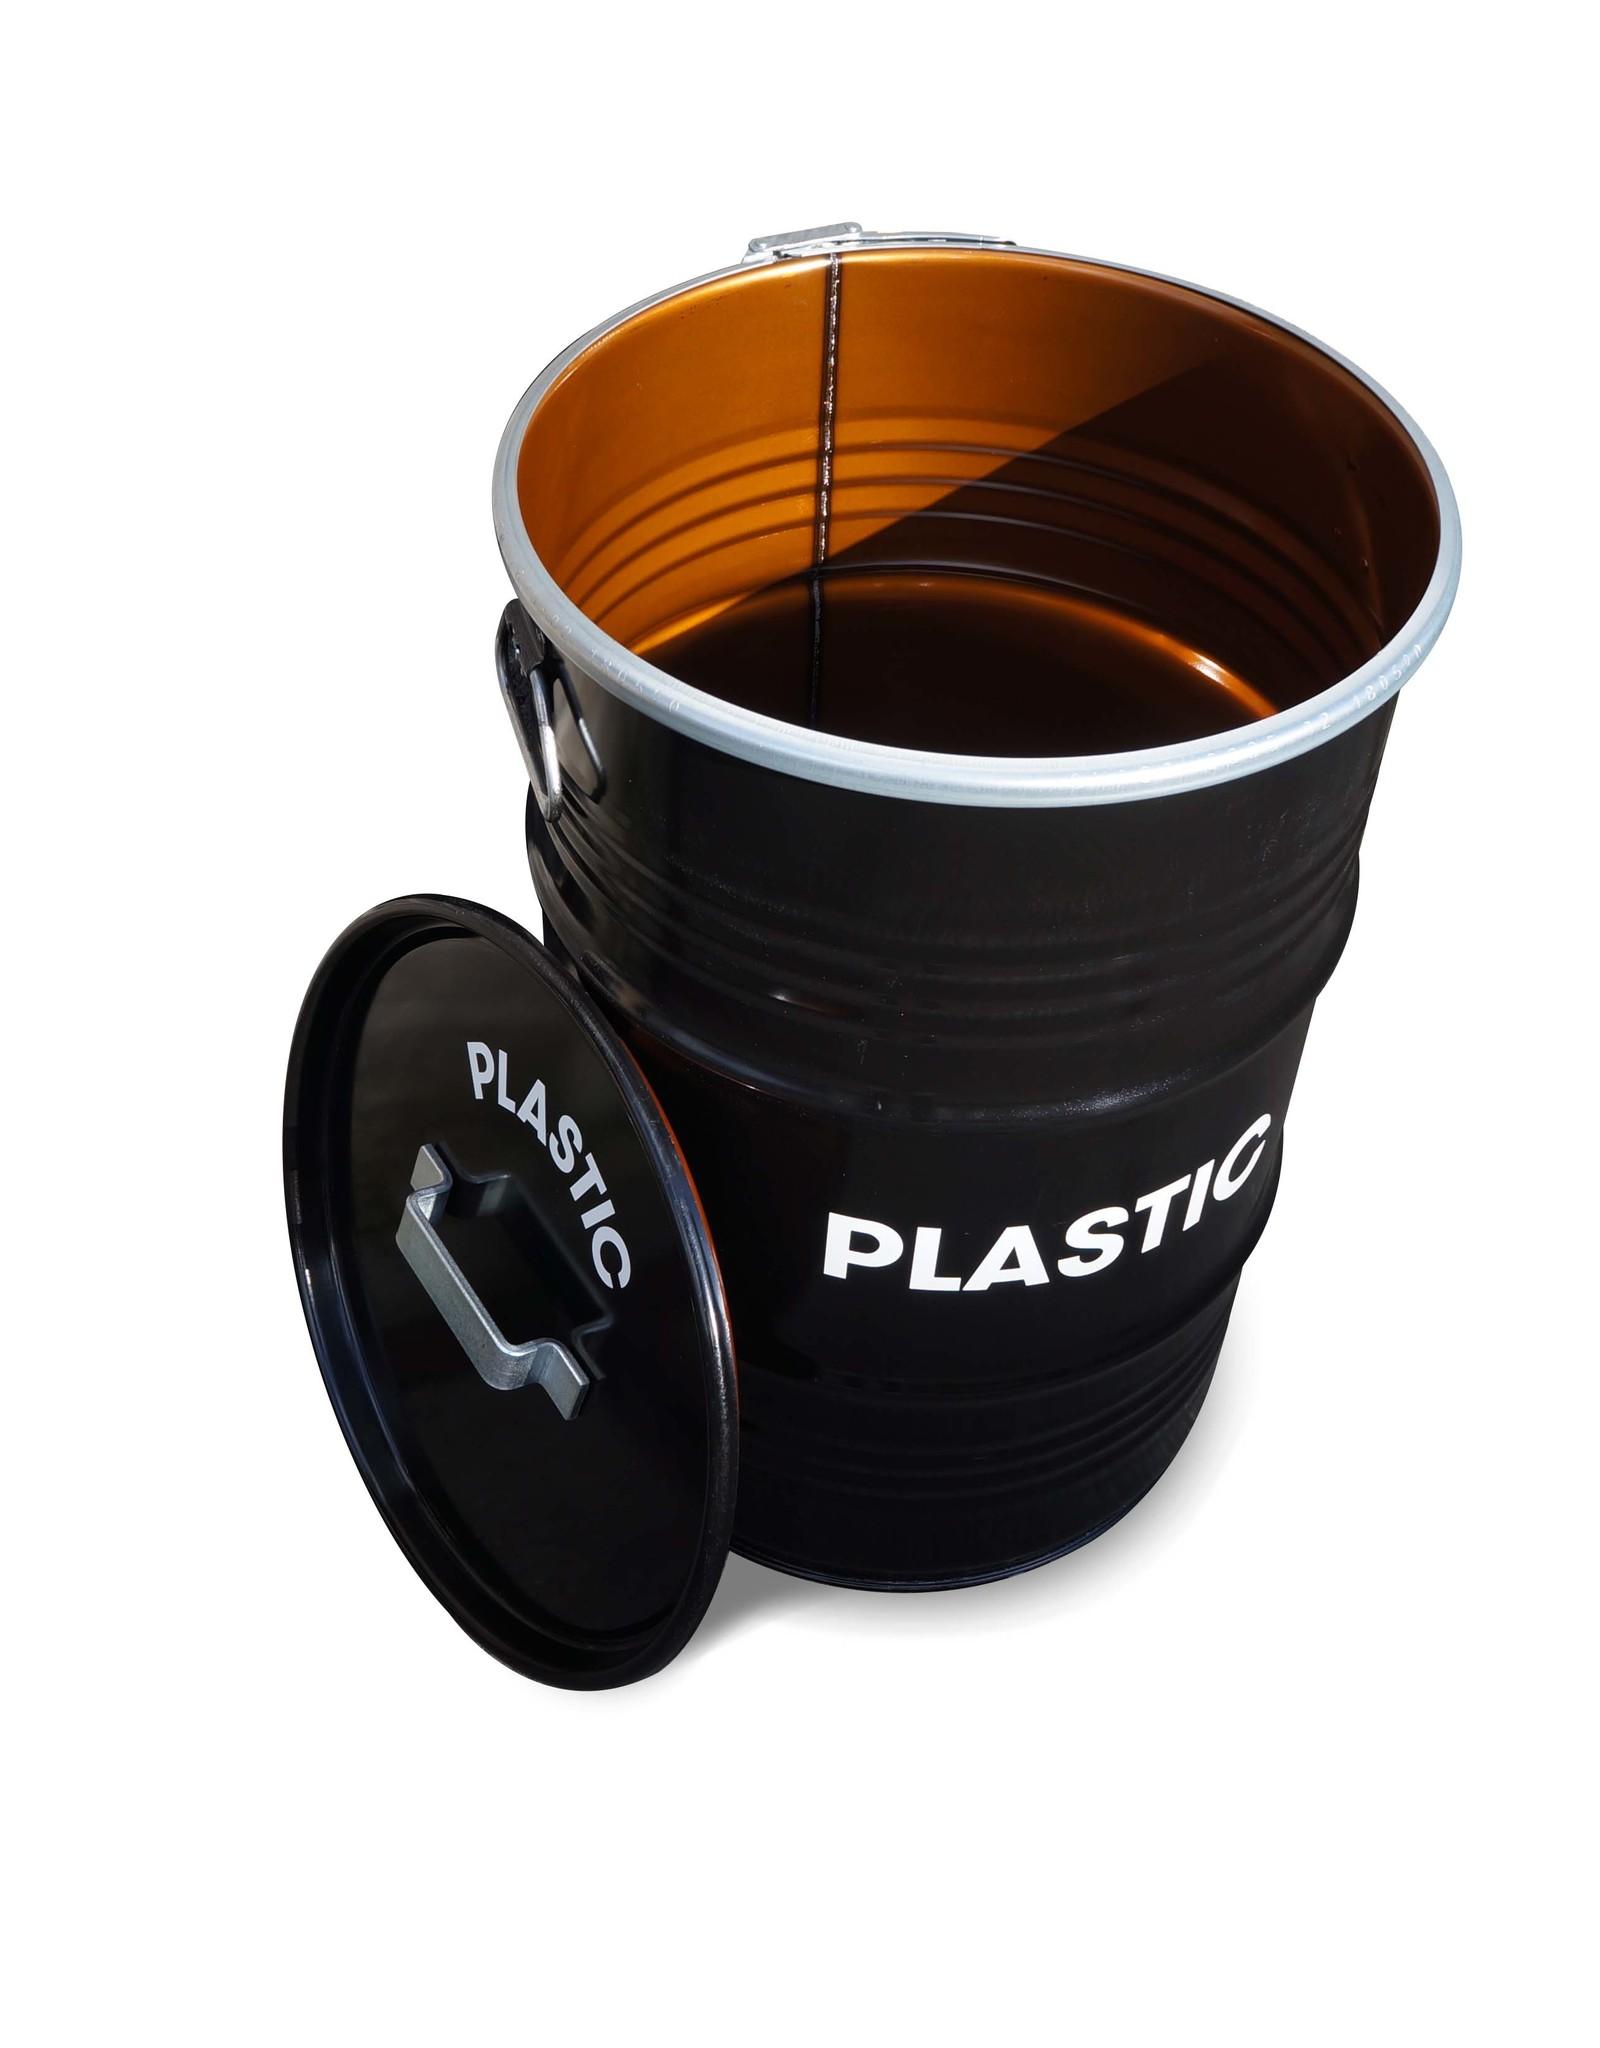 Barrelkings BinBin Handgriff Plastik industrieller Mülleimer Abfalltrennung 60 Liter Ölfass mit Deckelgriff